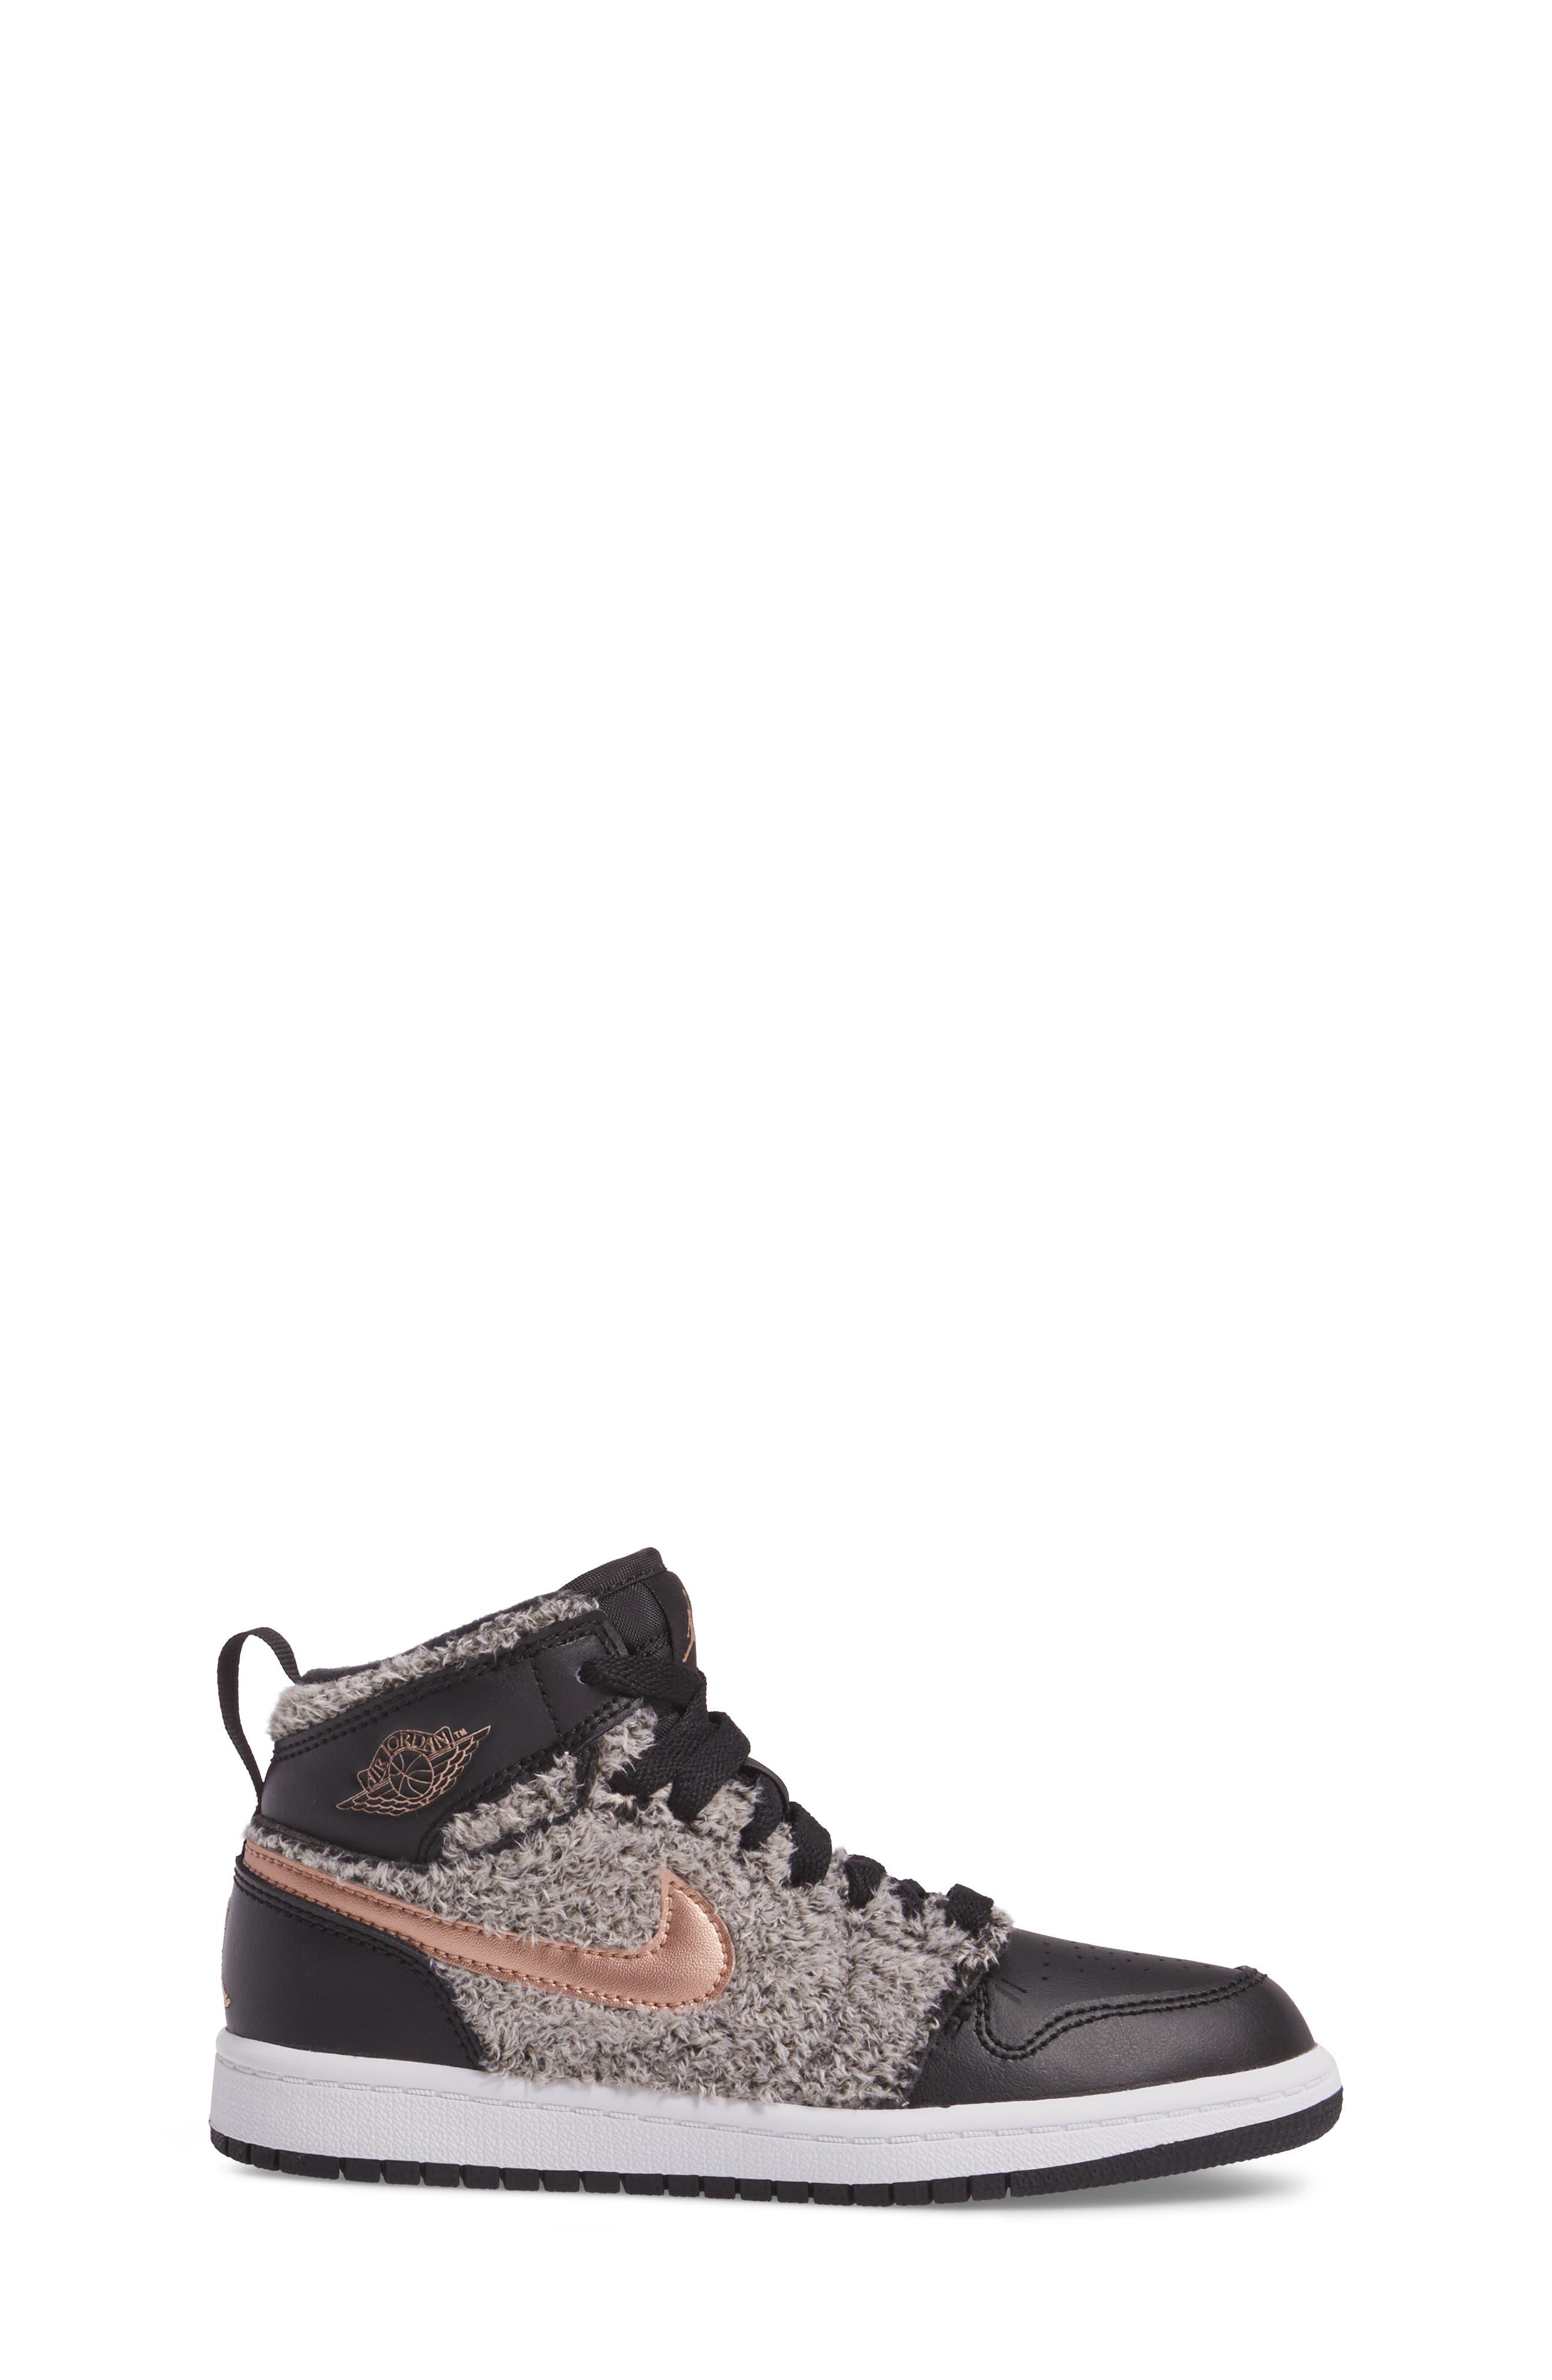 Alternate Image 3  - Nike Air Jordan 1 Retro Faux Fur High Top Sneaker (Toddler, Little Kid & Big Kid)